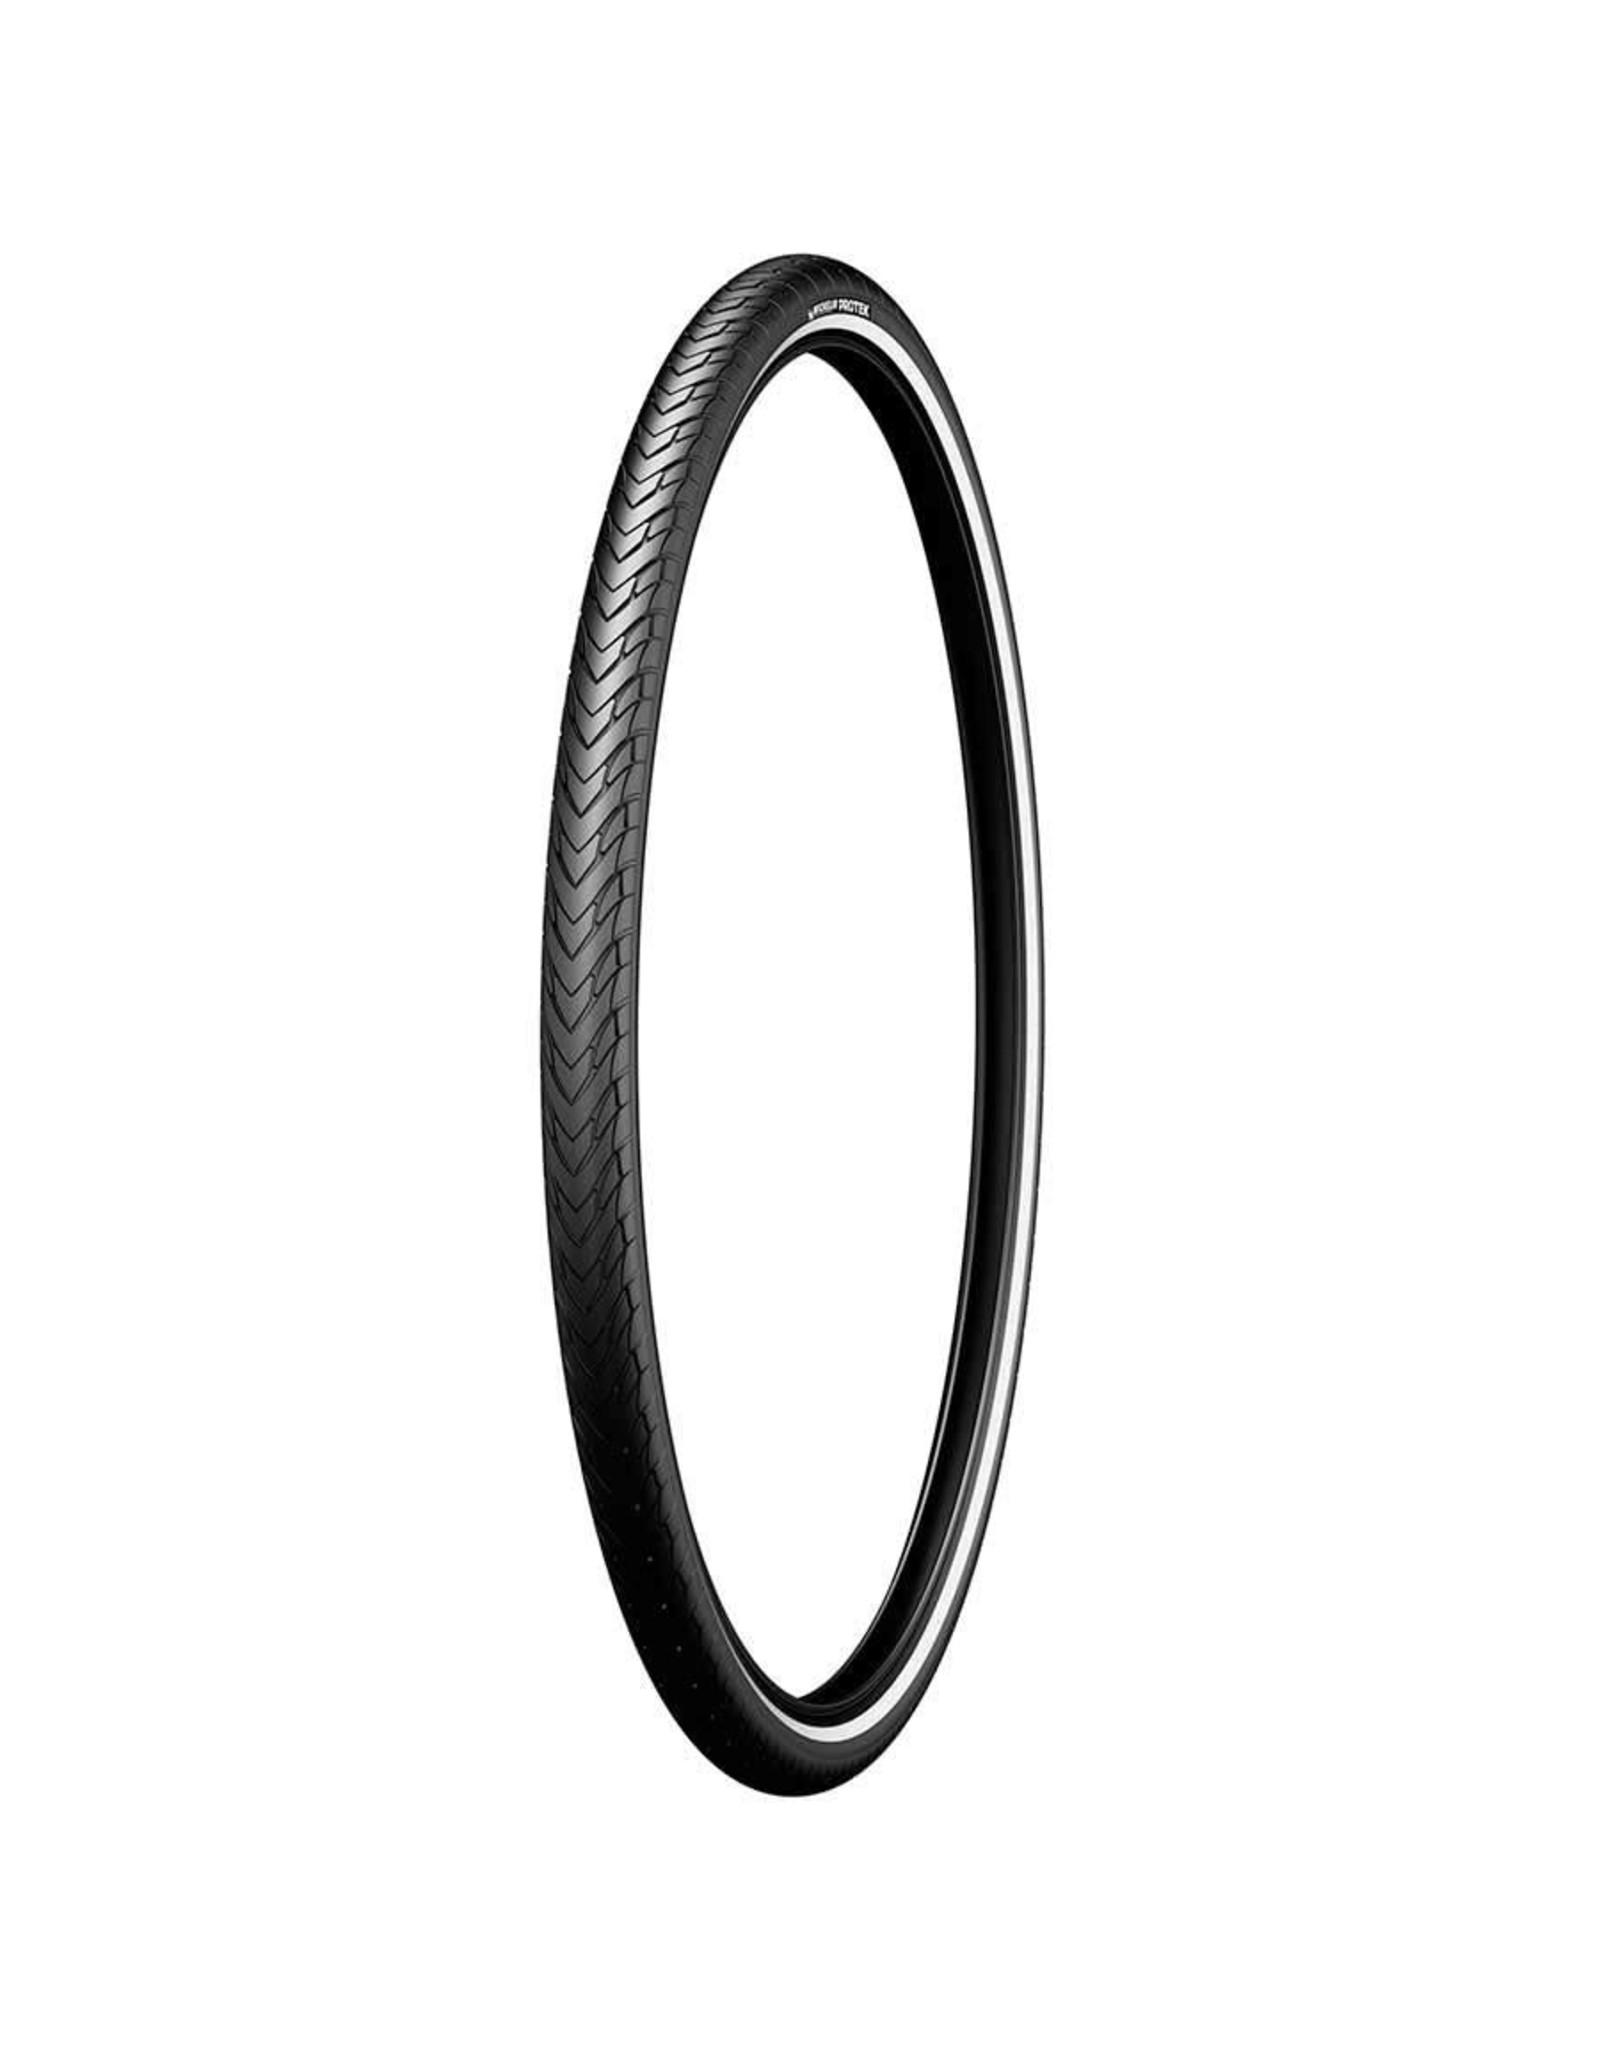 Michelin, Protek, Pneu, 700x35C, Rigide, Tringle, Protek 1mm, Reflex, 22TPI, Noir